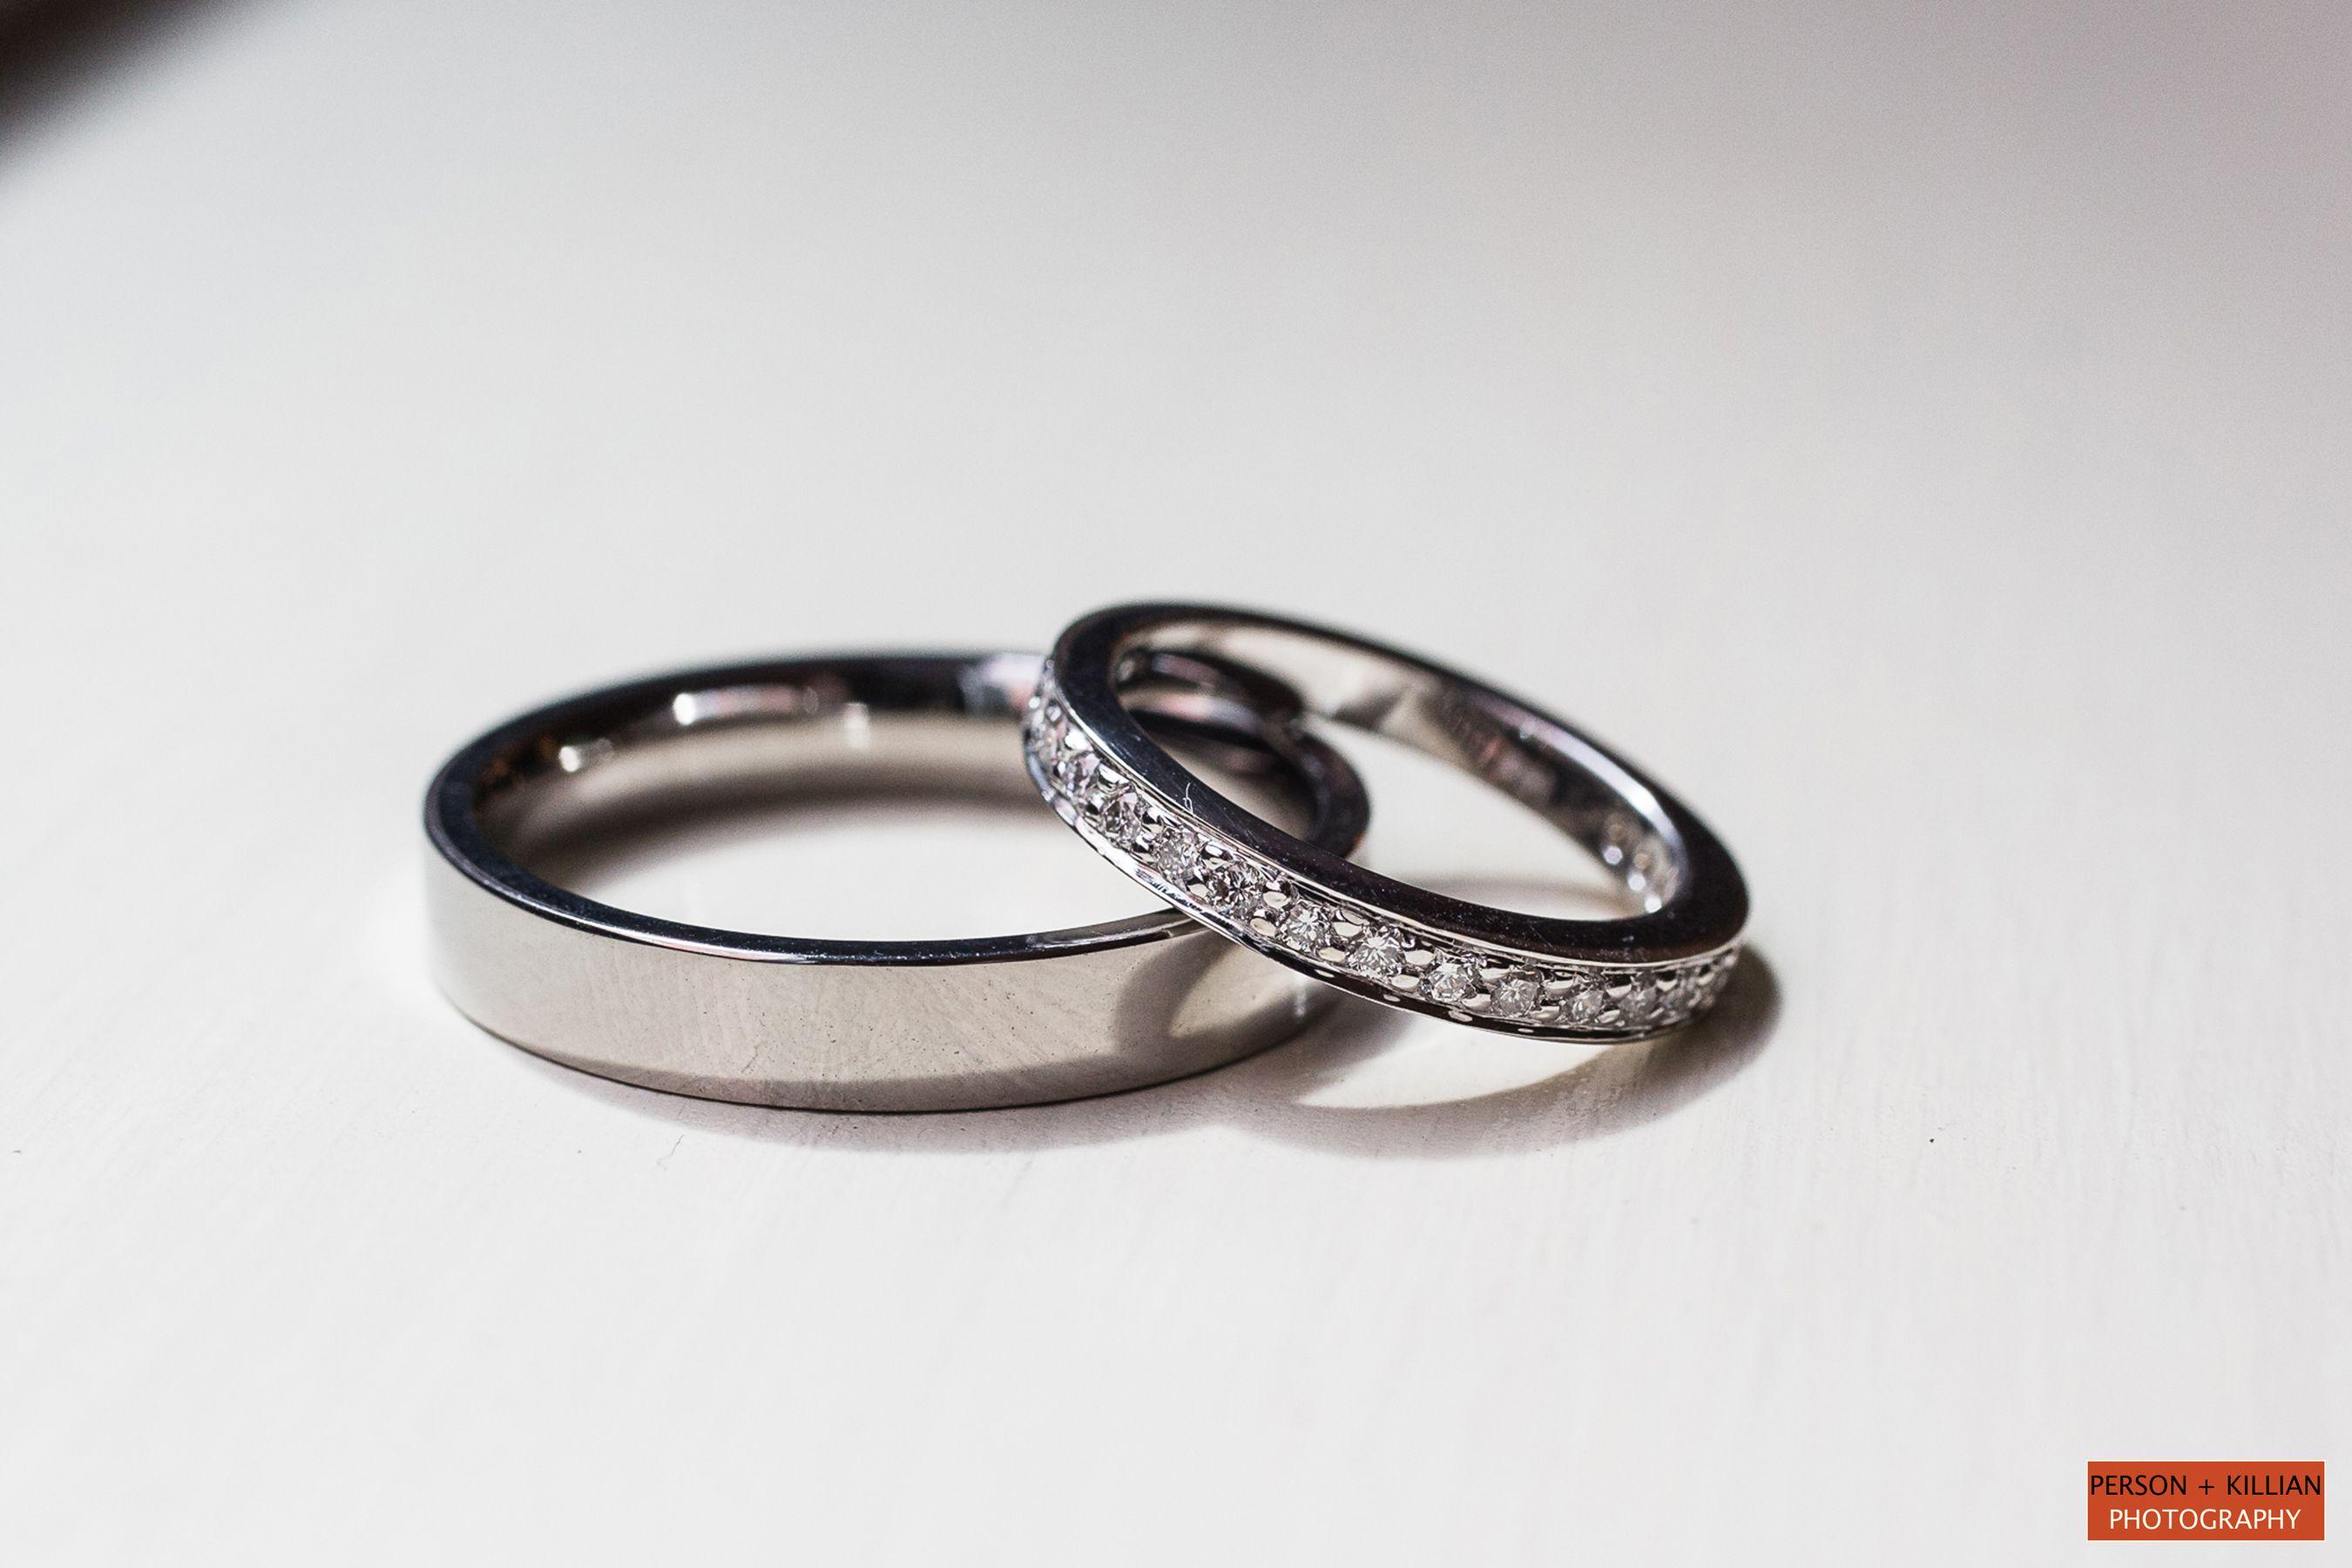 Wedding Band Photography Silver And Diamond Wedding Rings Slim Band Wedding Ring His And He Boston Wedding Photographer Wedding Boston Diamond Wedding Rings